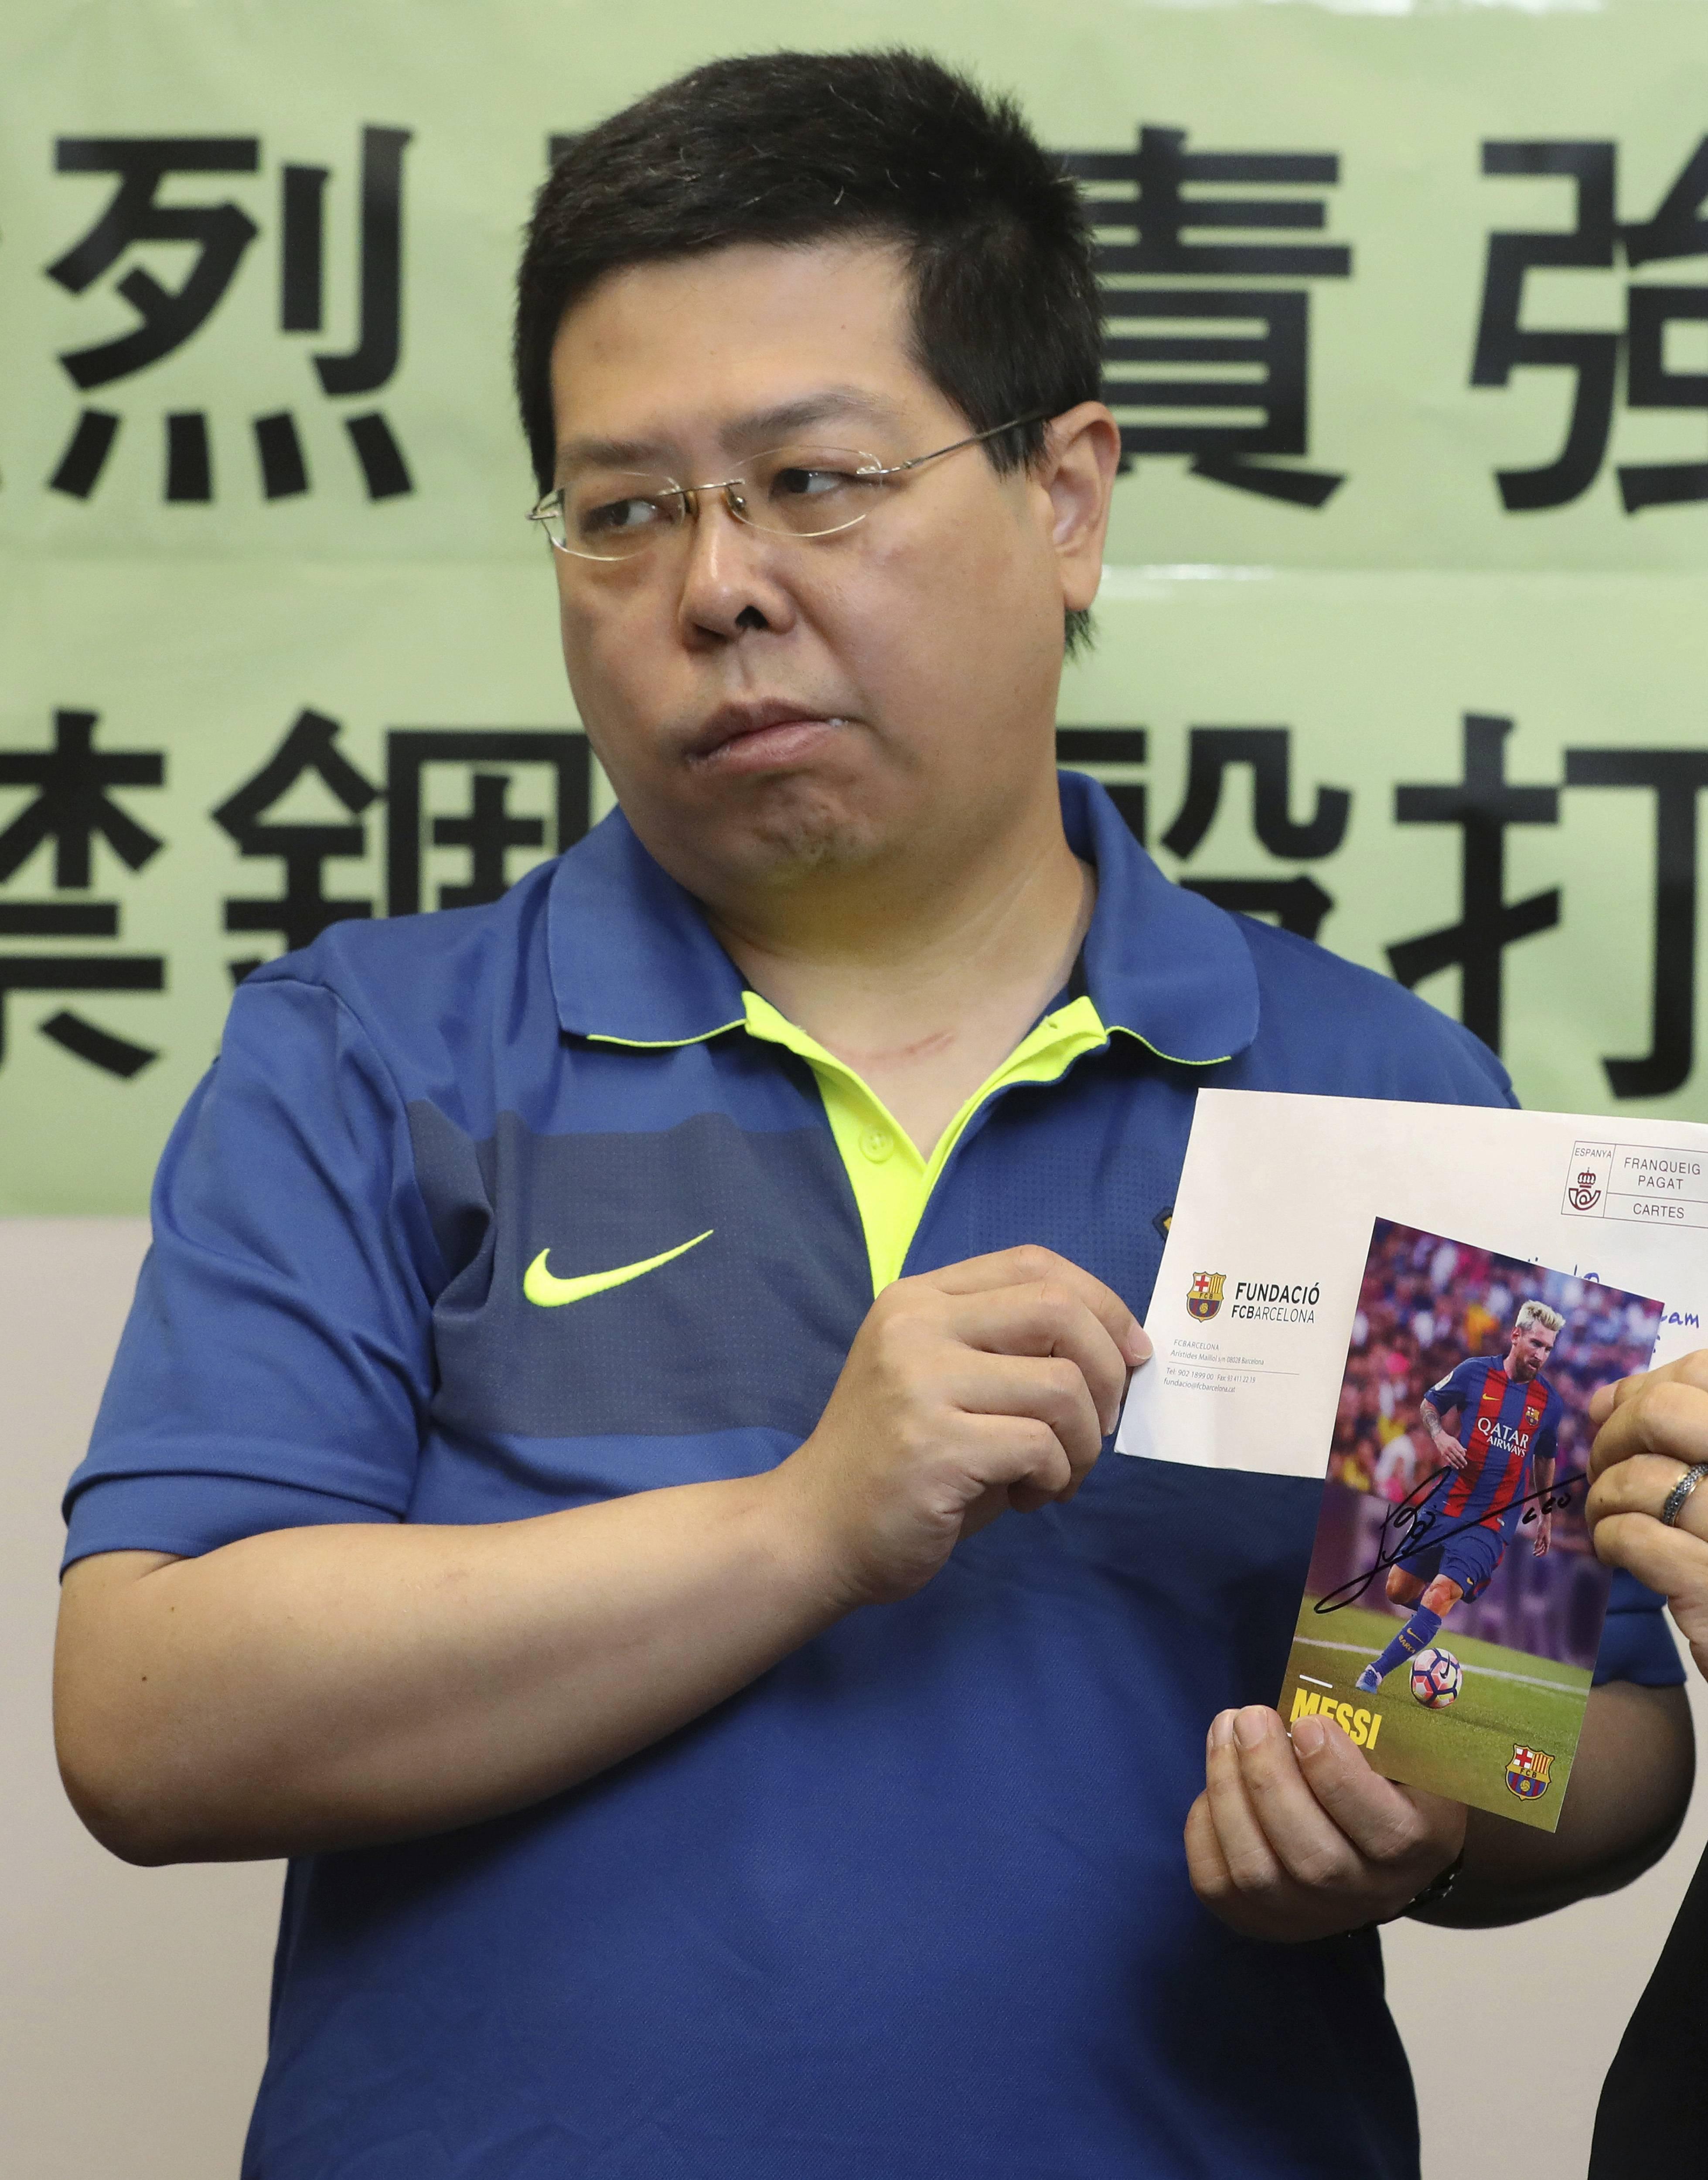 hongkongdissidentmpuer2-84750c73e29e97245422c086a641d860.jpg